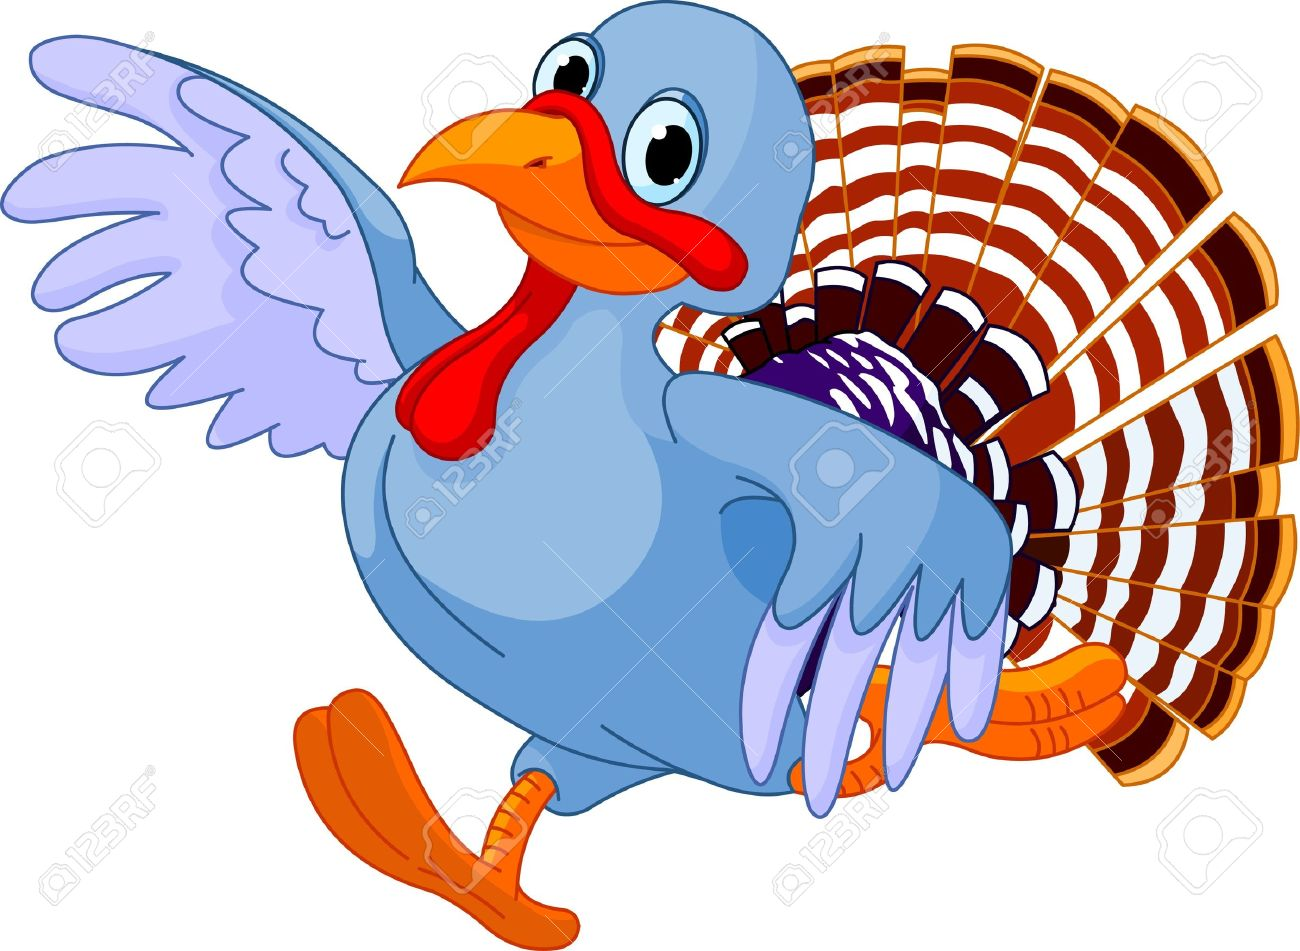 1300x951 Turkey Cartoon Stock Photos Amp Pictures. Royalty Free Turkey